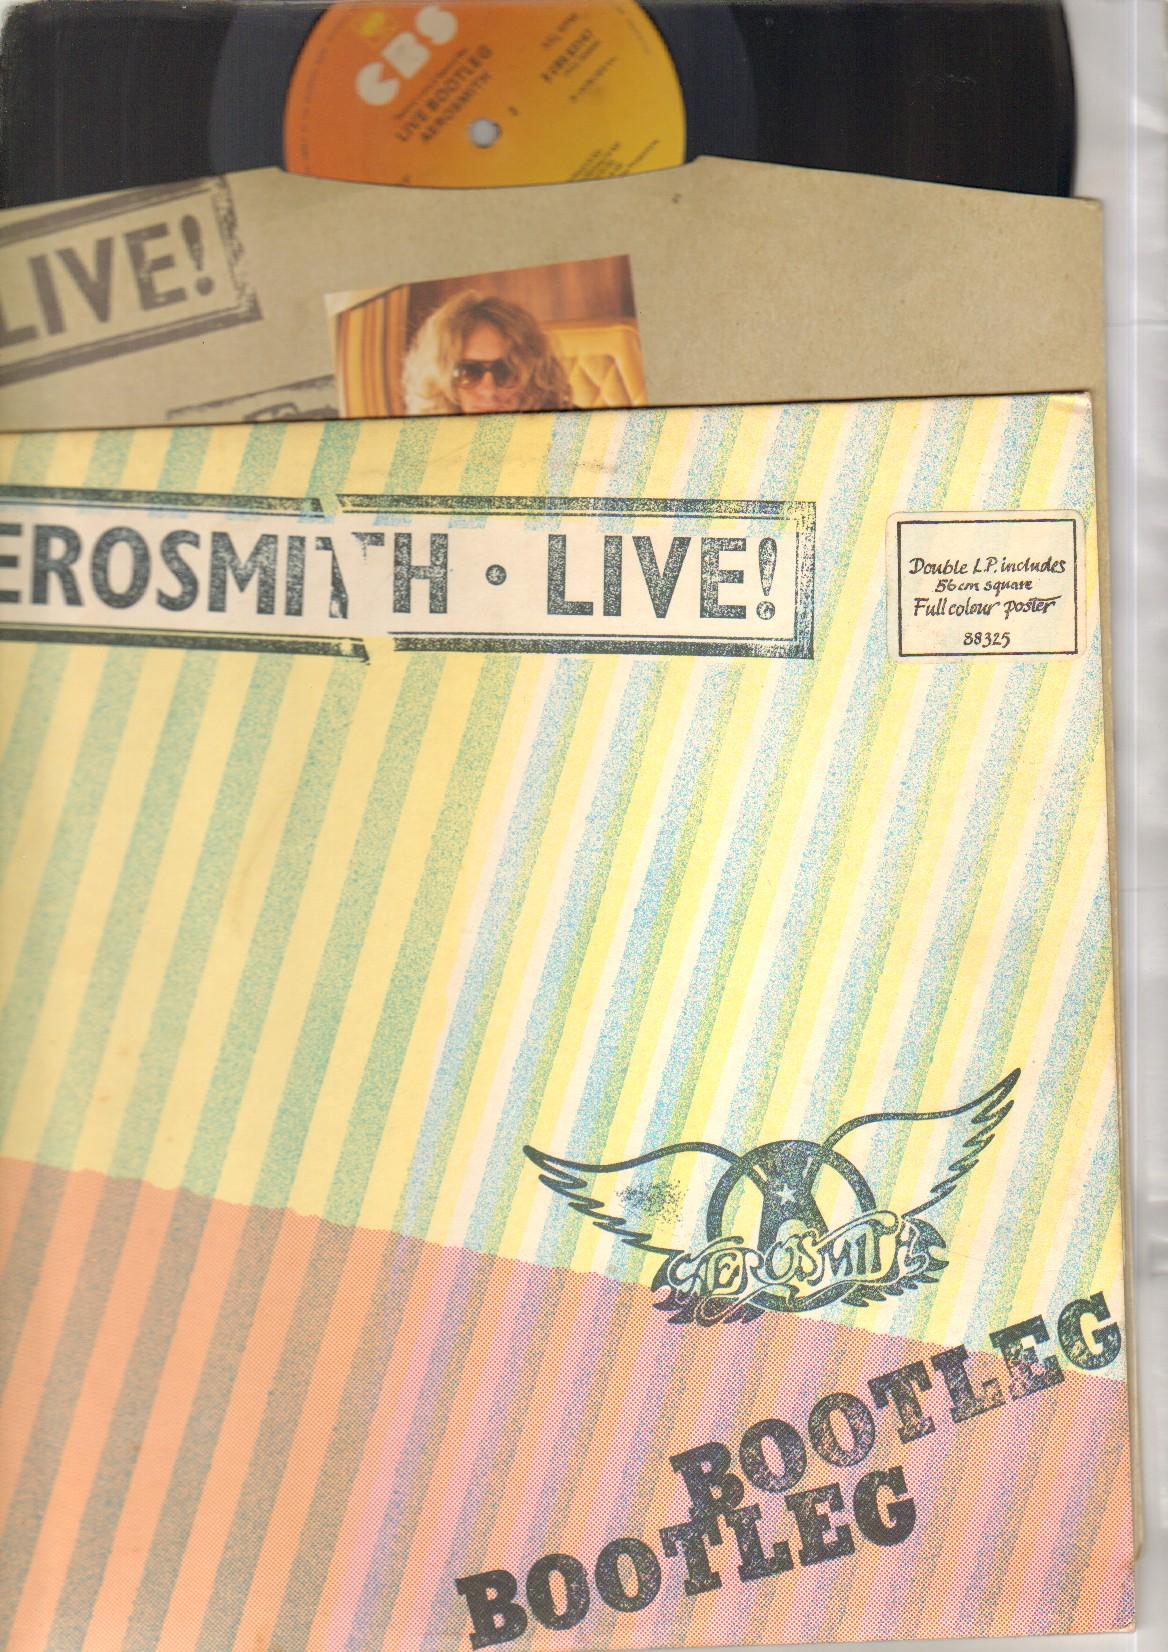 Aerosmith live bootleg album cover